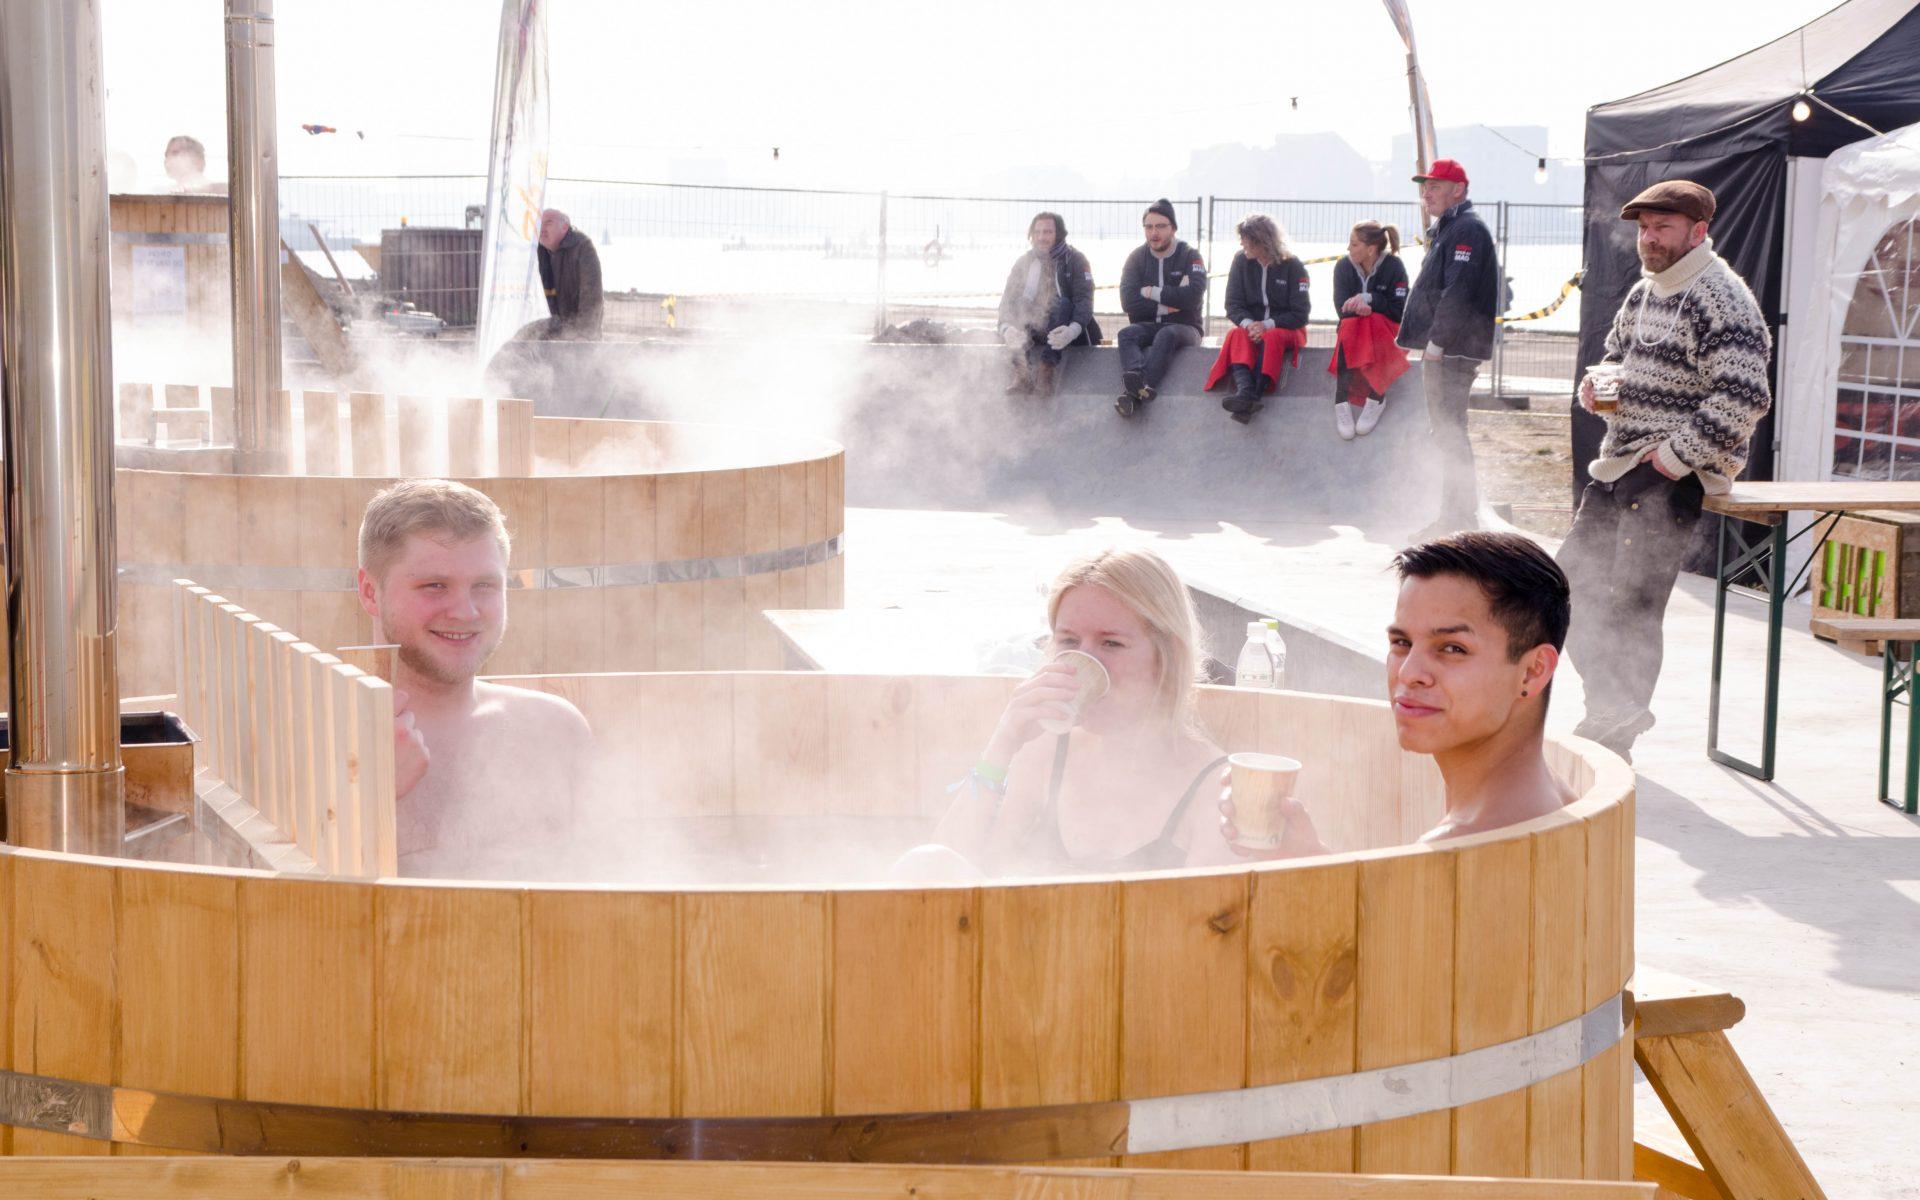 kulturhavn365_sauna-event01